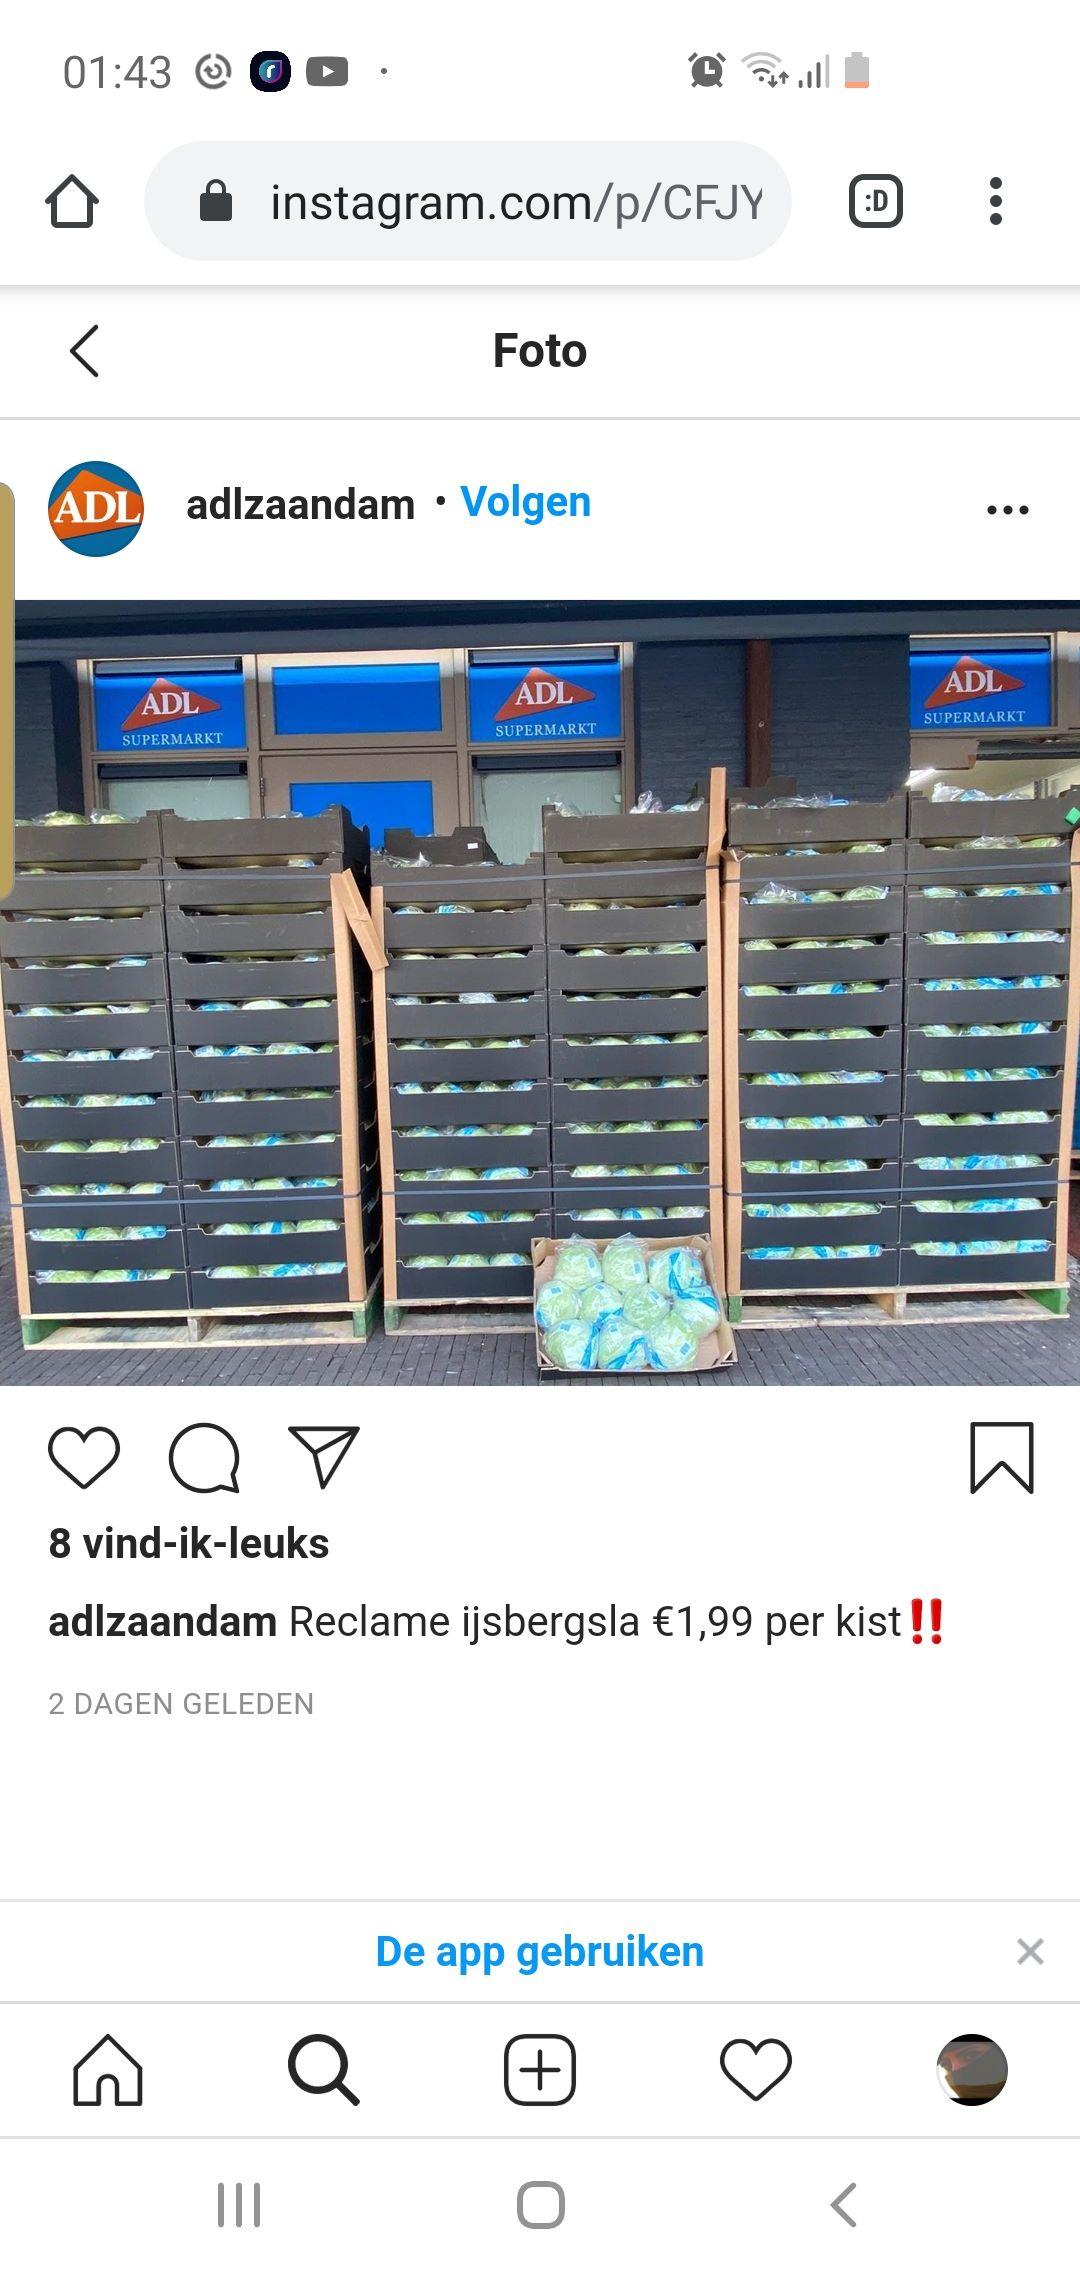 [lokaal] Kist ijsbergsla @ ADL supermarkt Zaandam